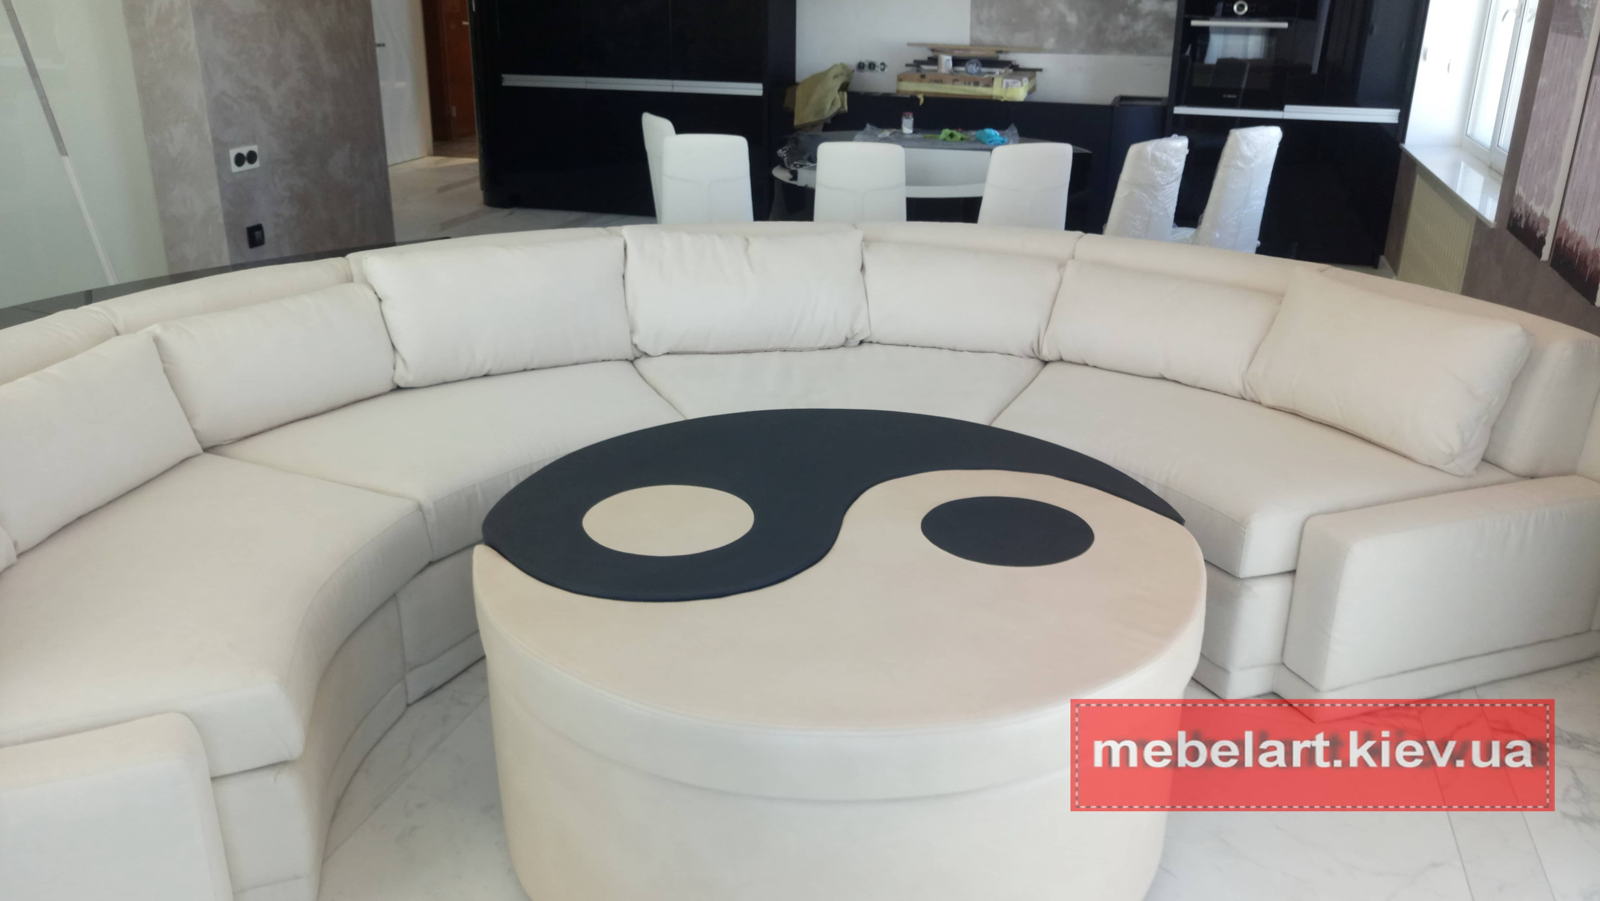 круглая мягкая мебель с круглым пуфом